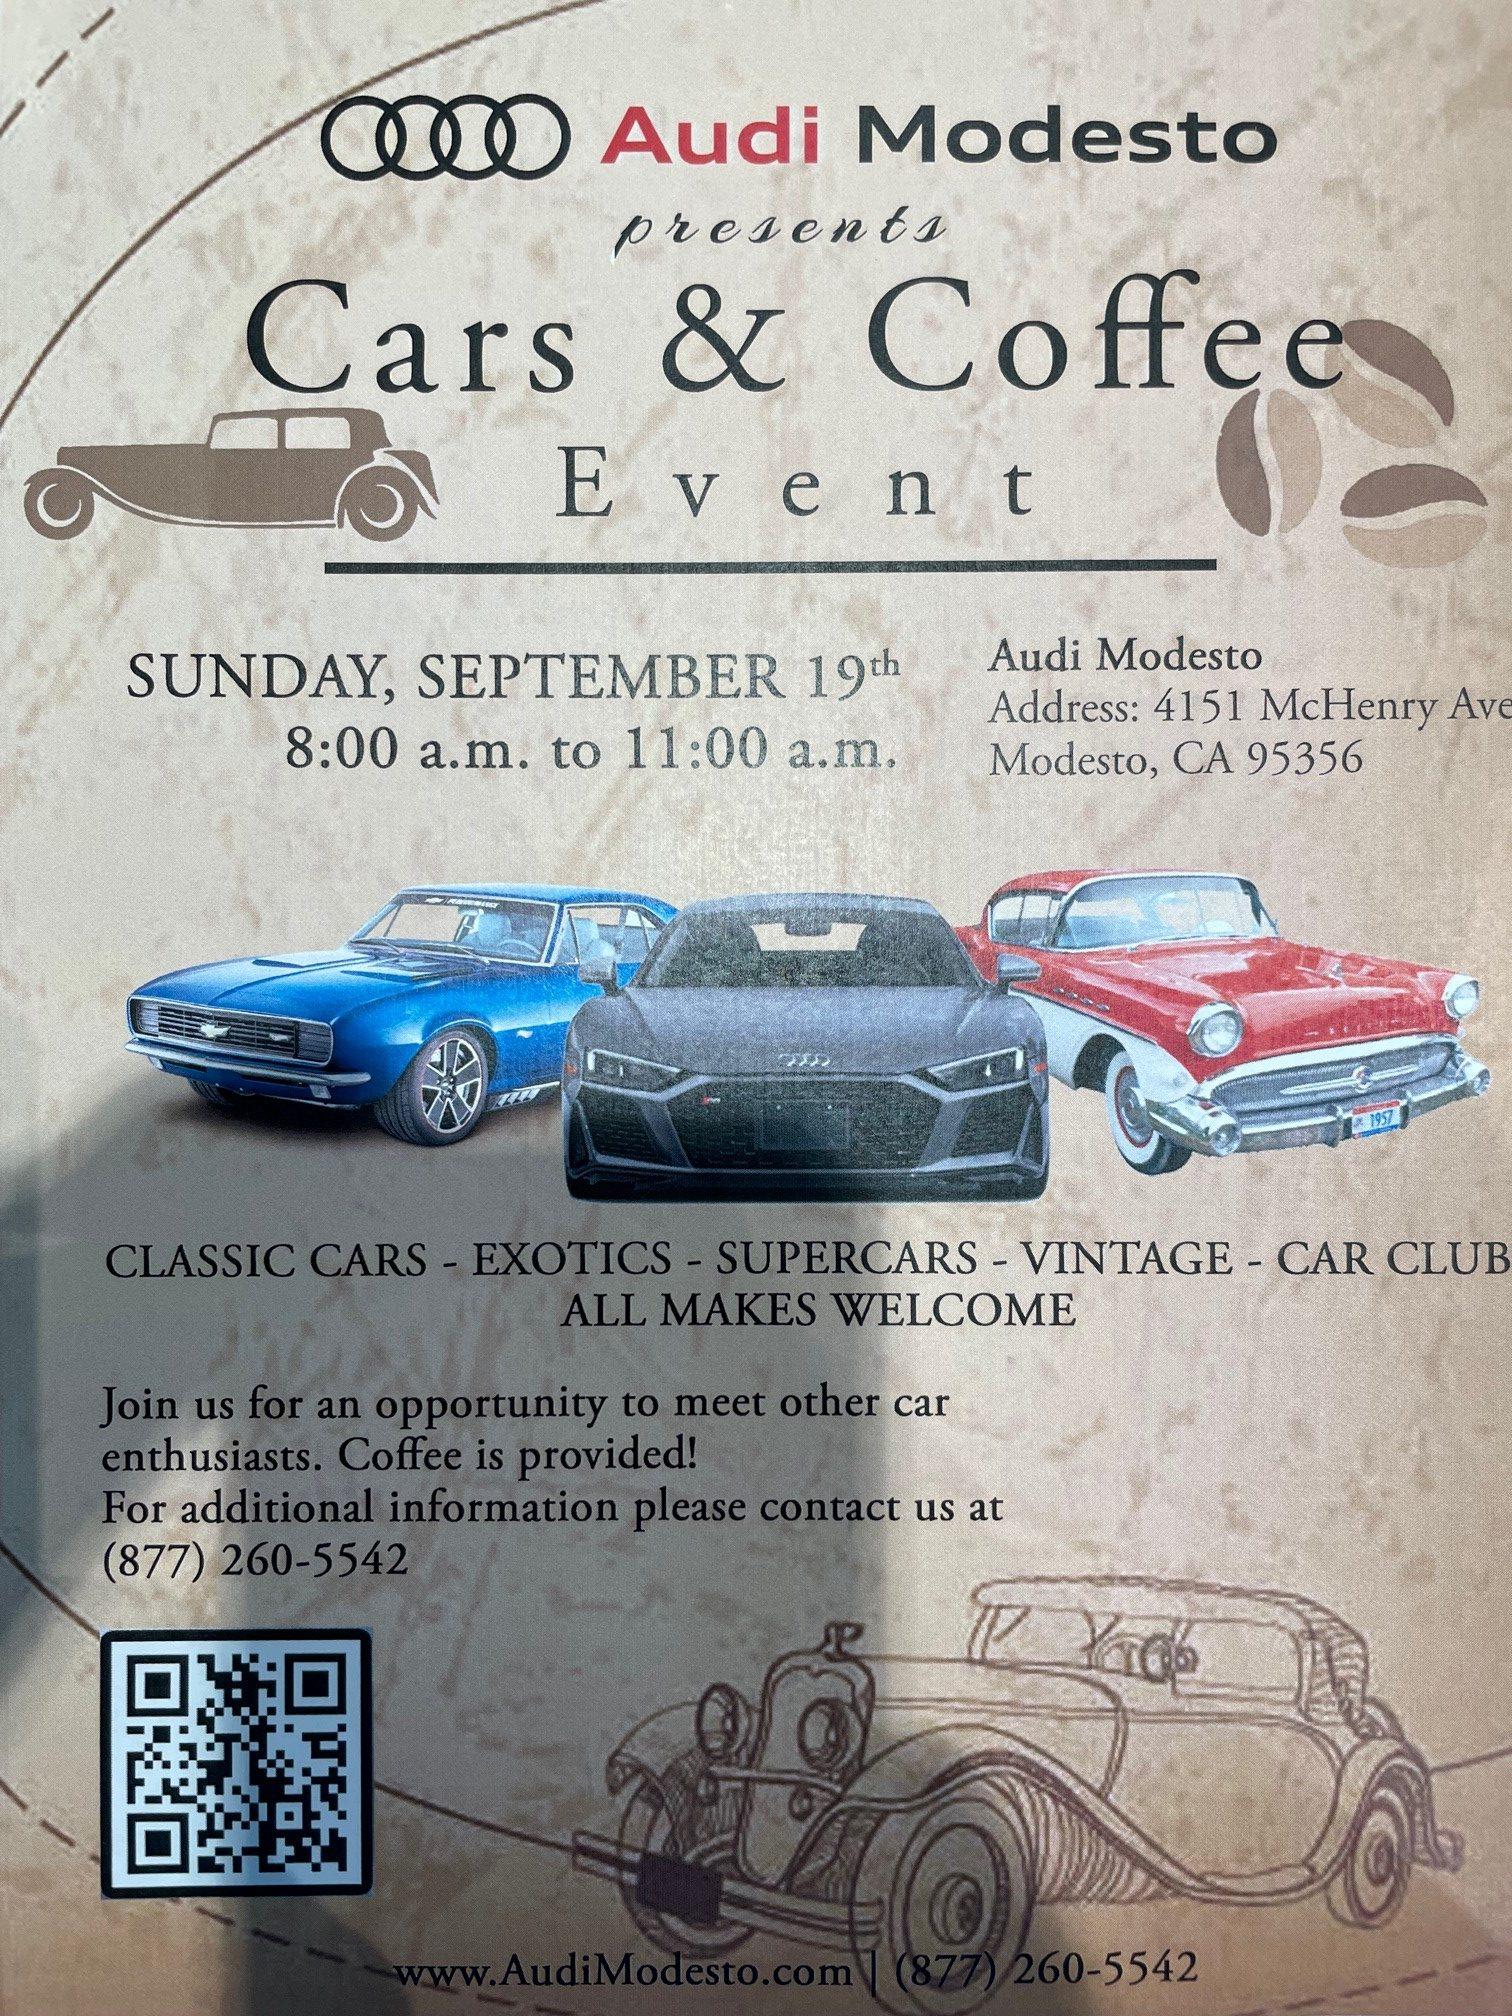 Audi Modesto Cars & Coffee